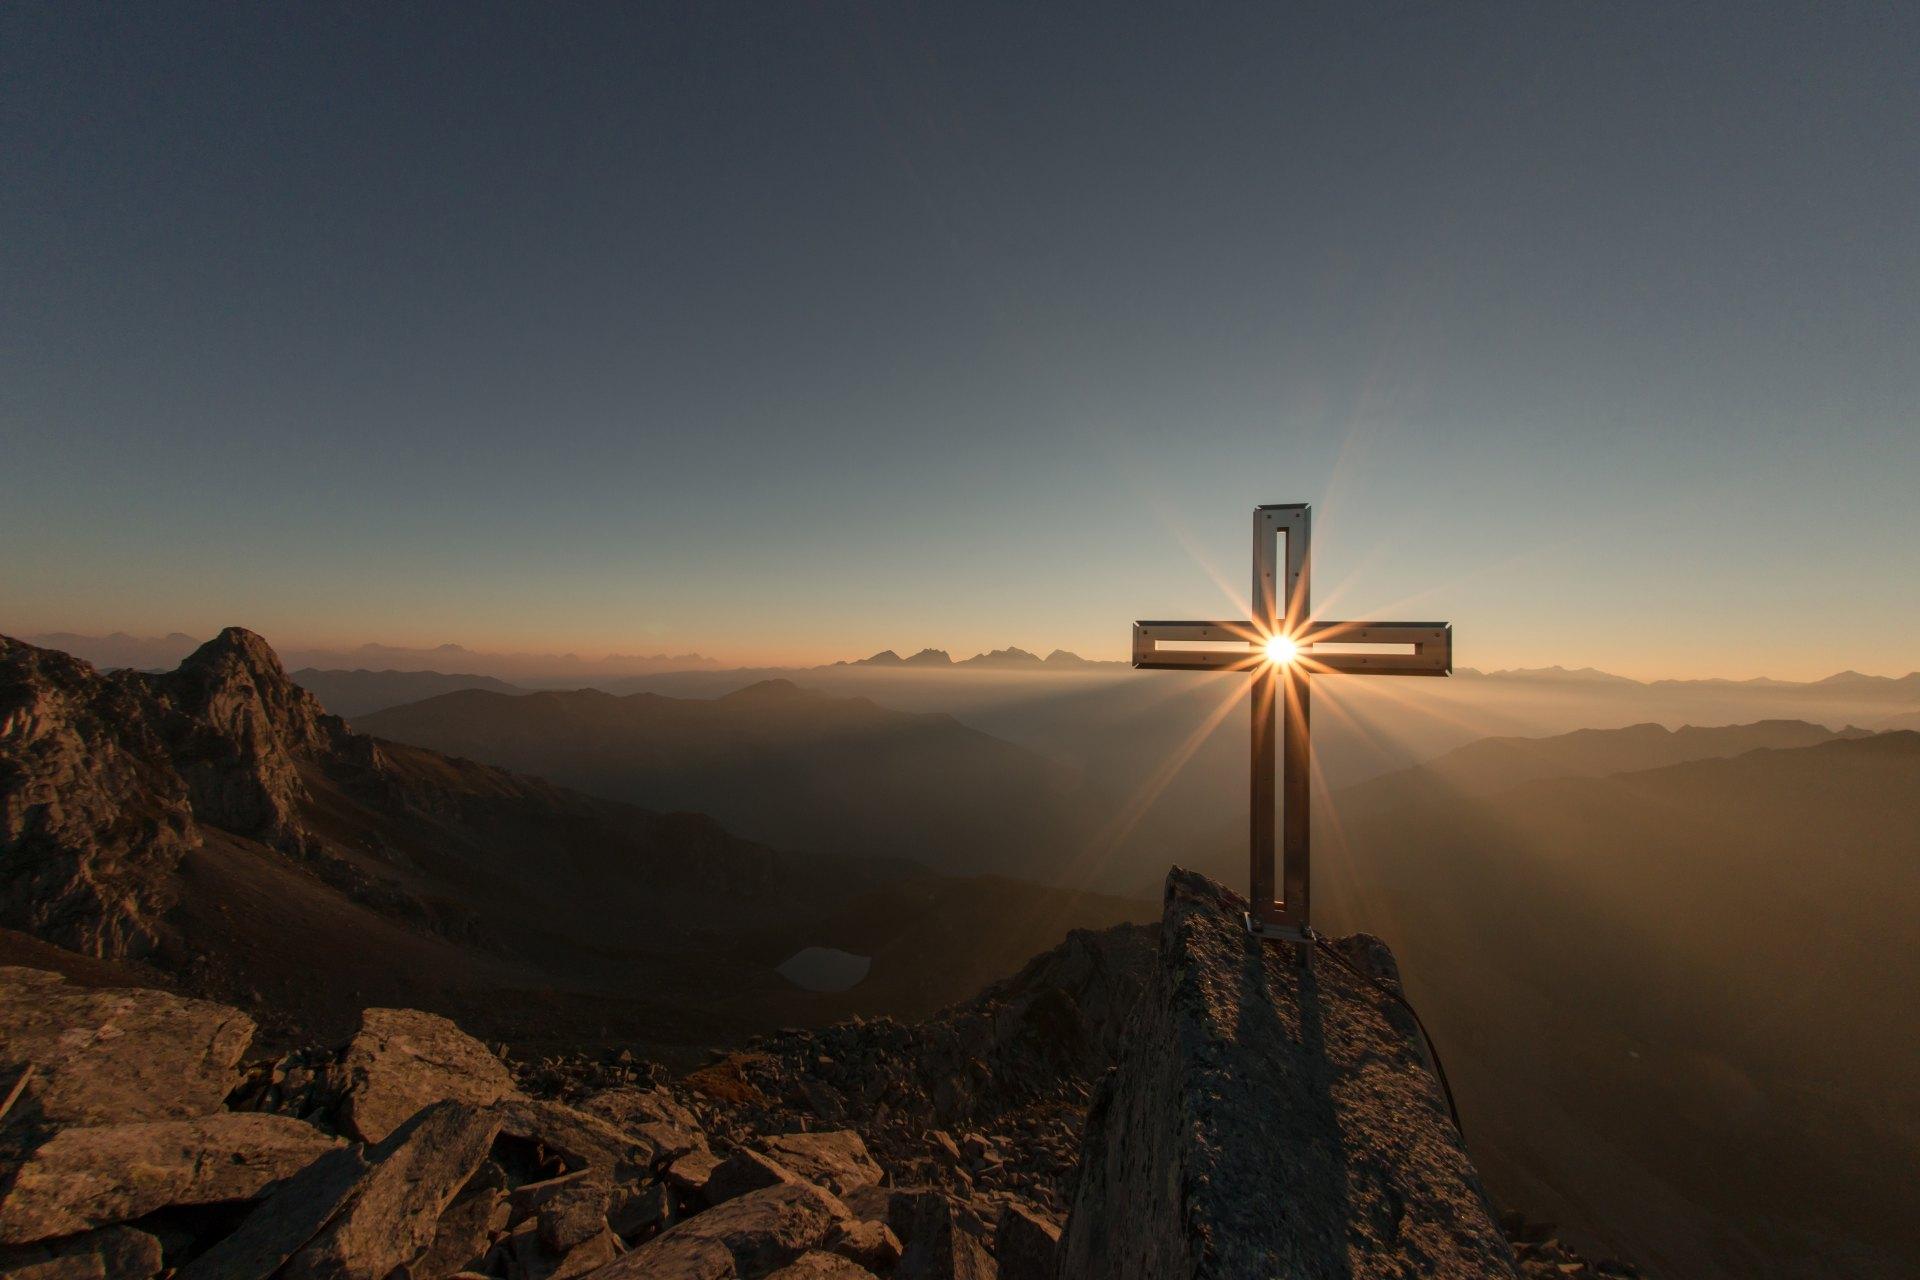 Eberhard Grossgasteiger Cross the Sun